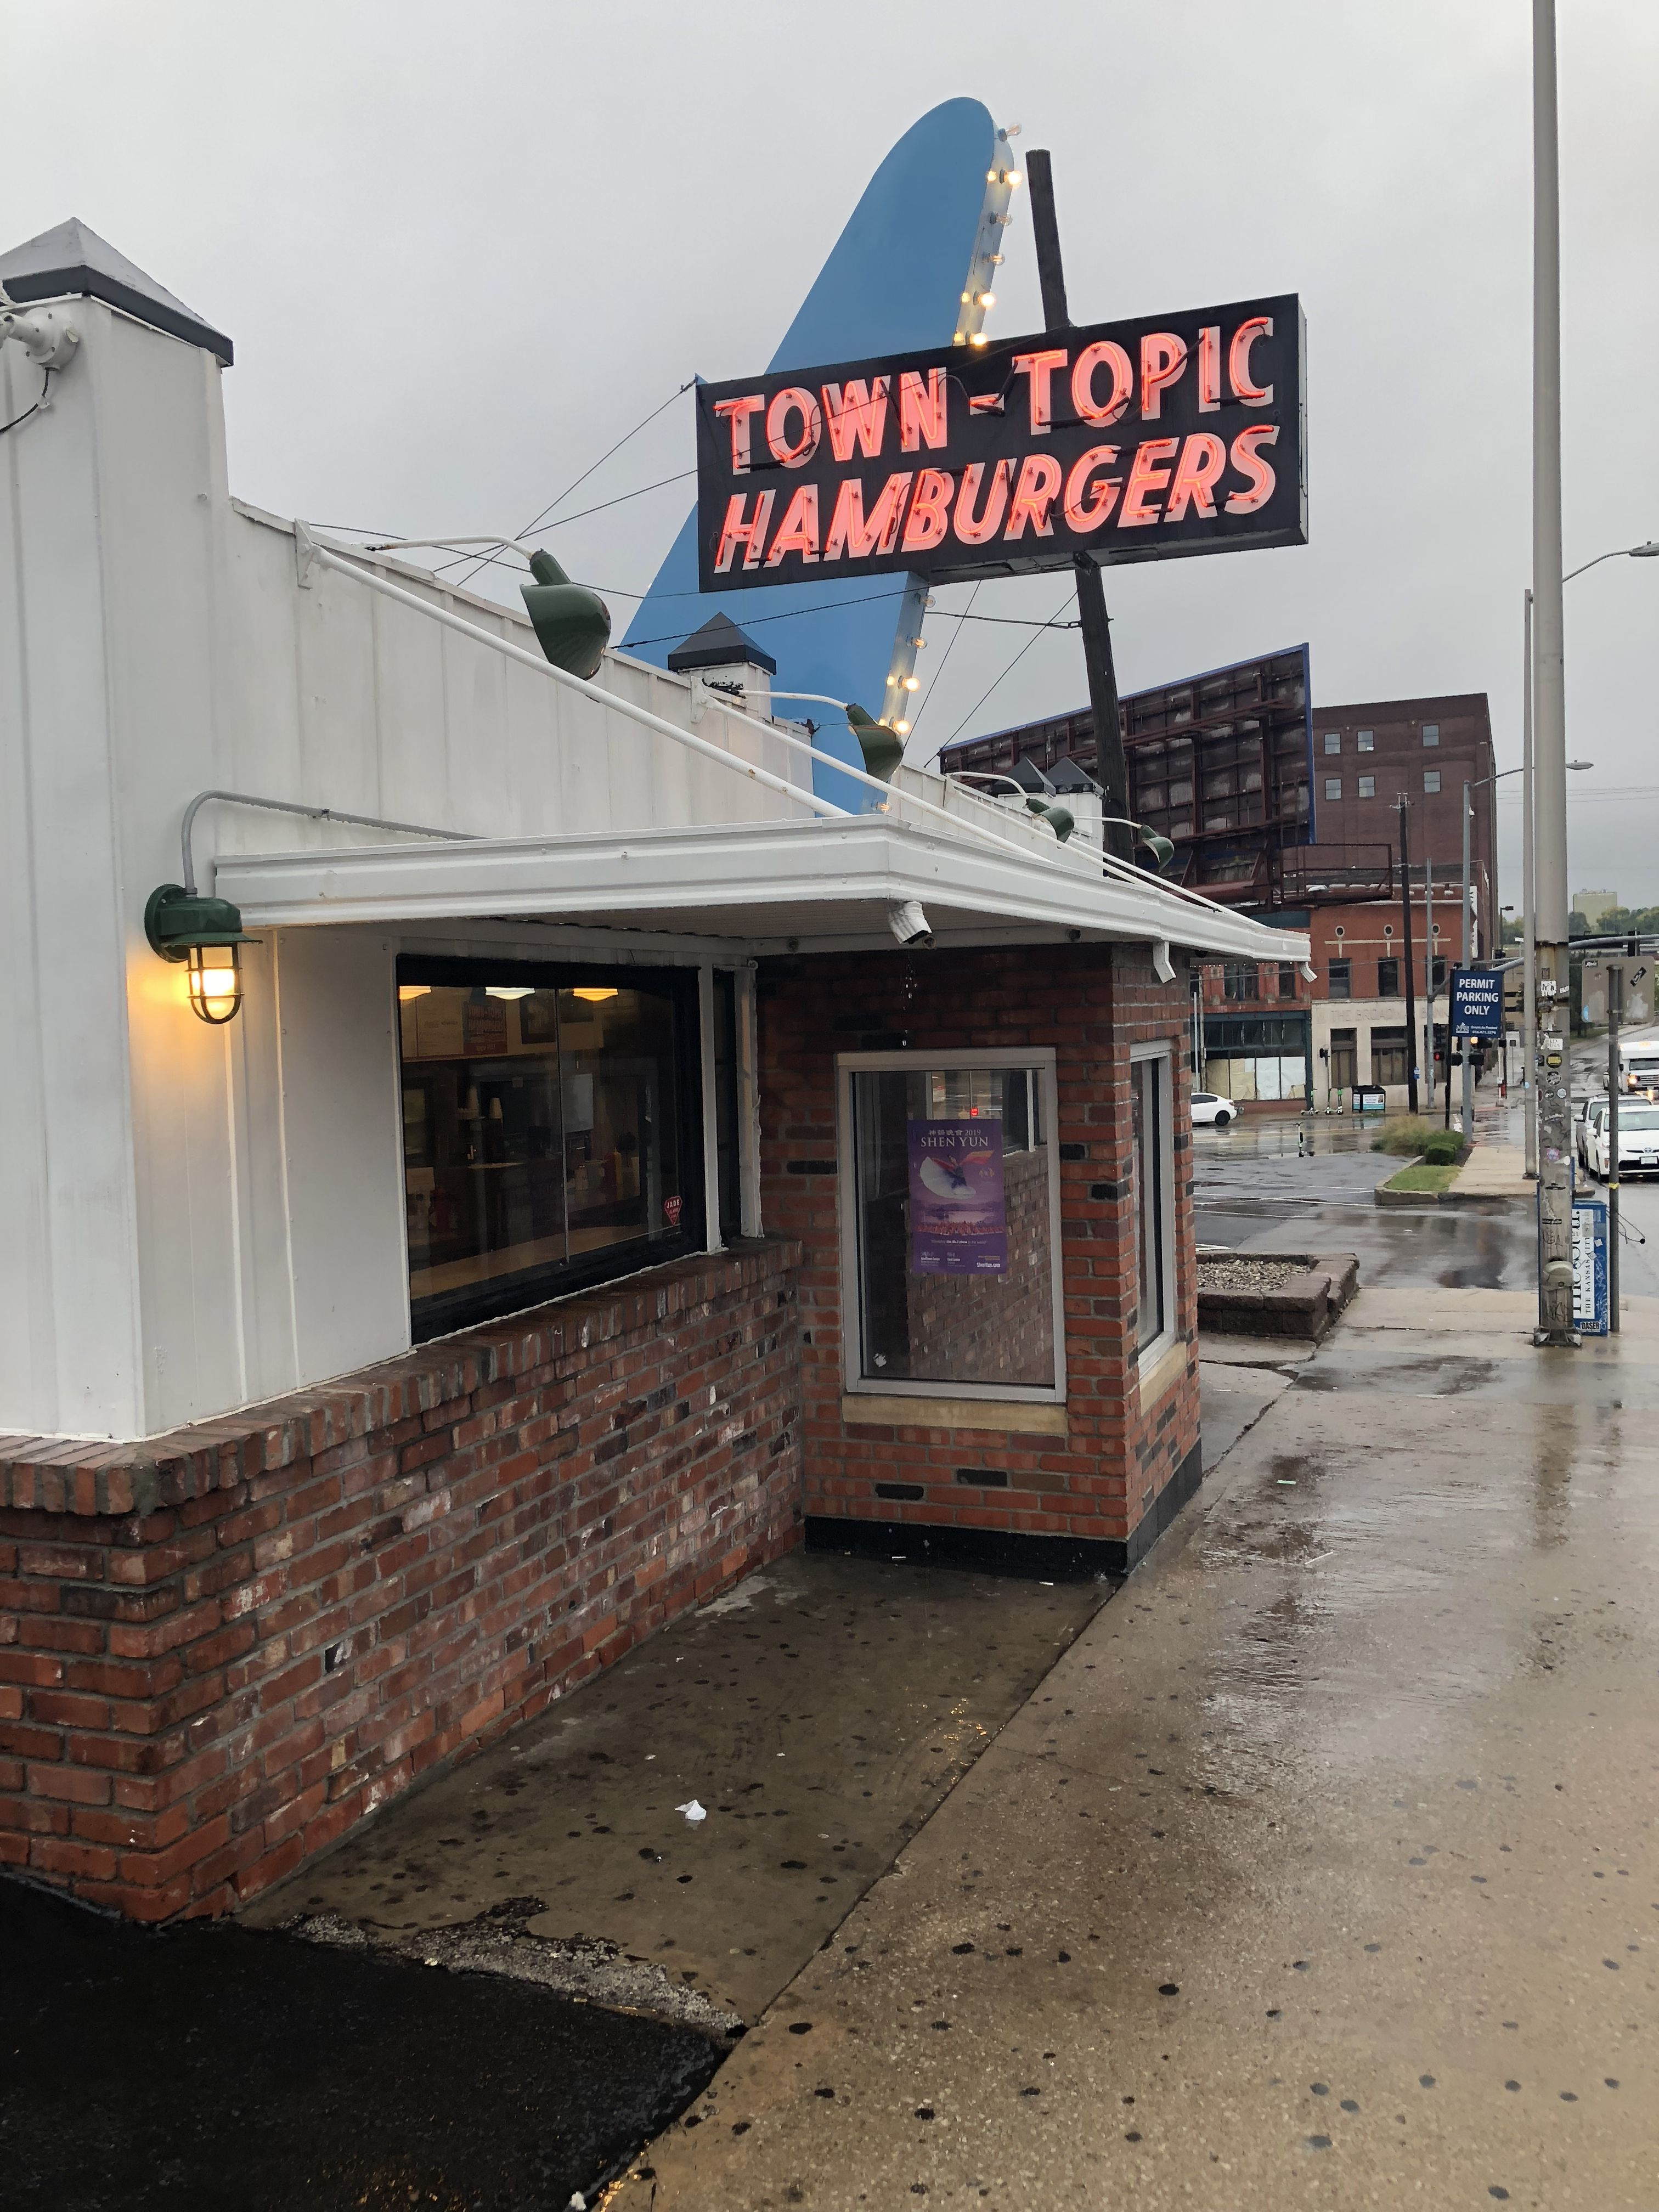 Town Topic Hamburgers Broadway Location Kansas City Missouri Places To See Kansas City Travel Posters